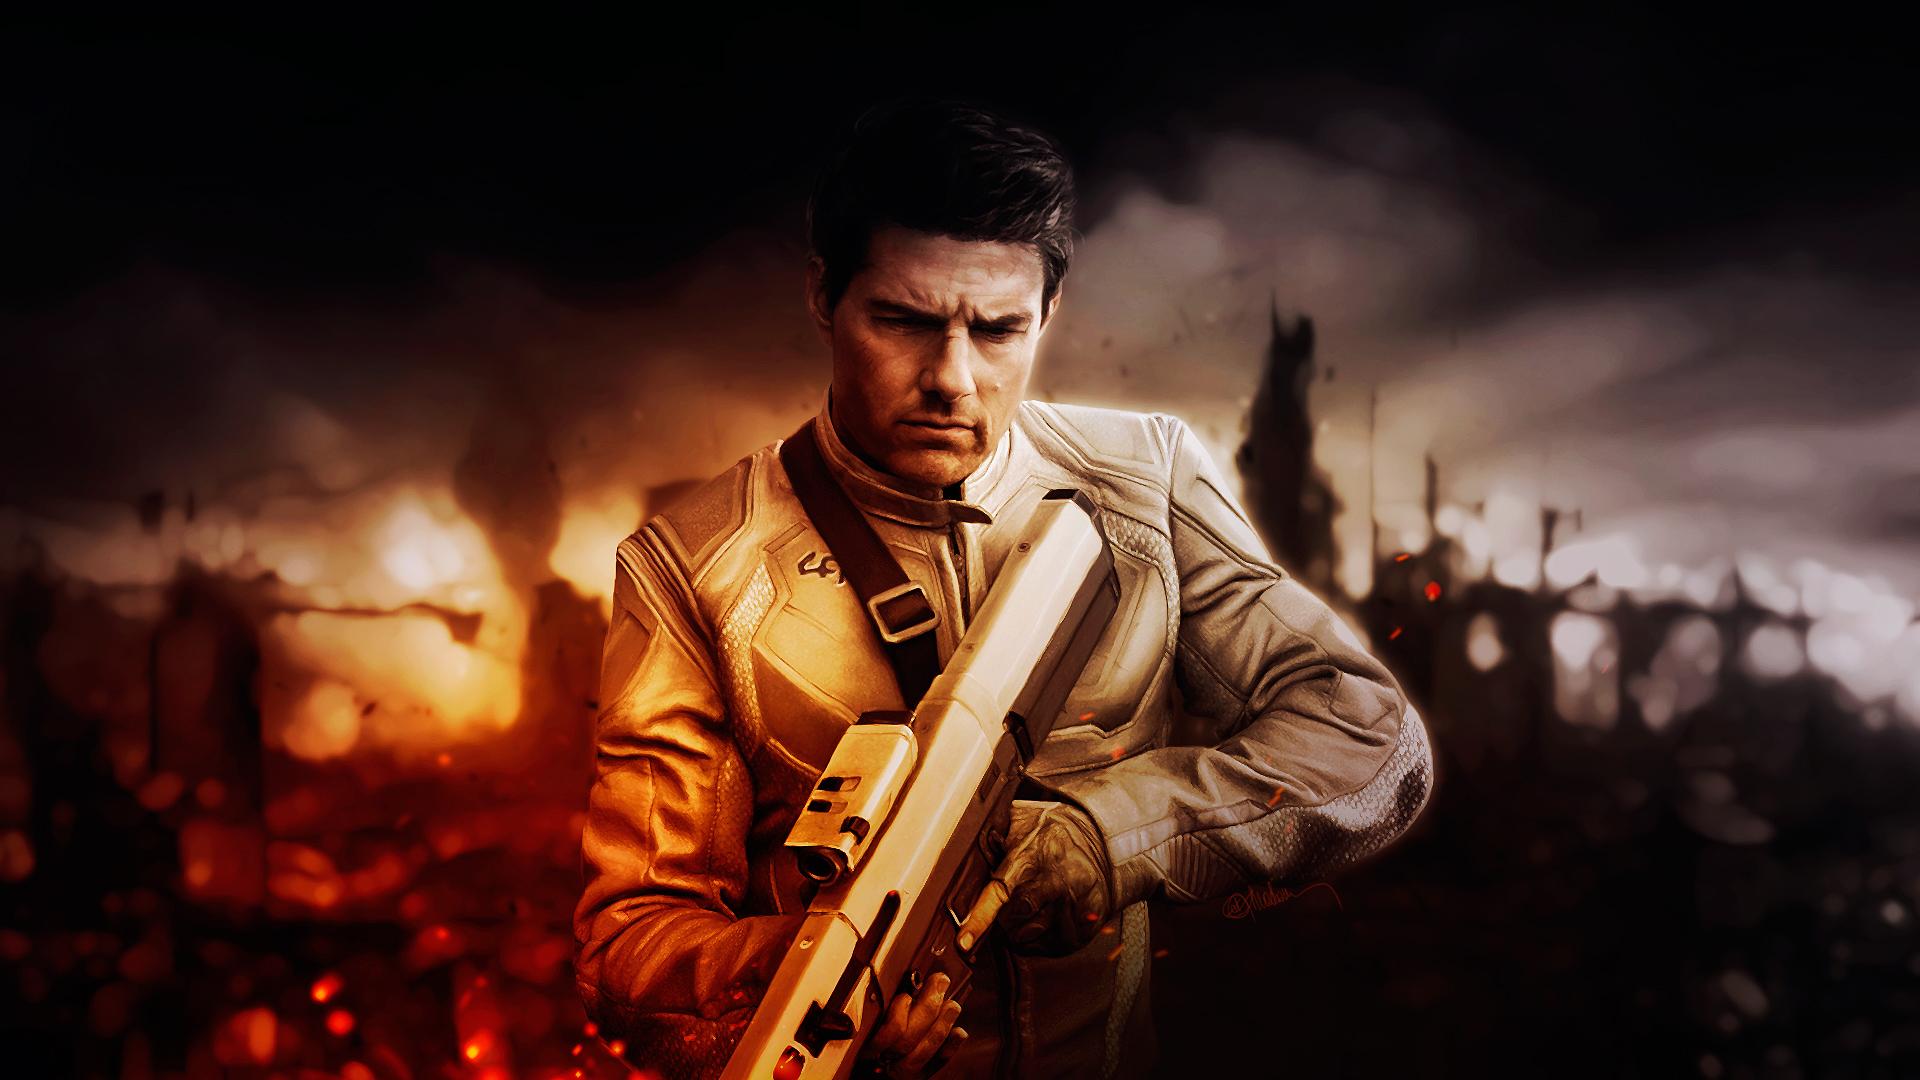 Tom Cruise Oblivion 21371 6956553 1920x1080